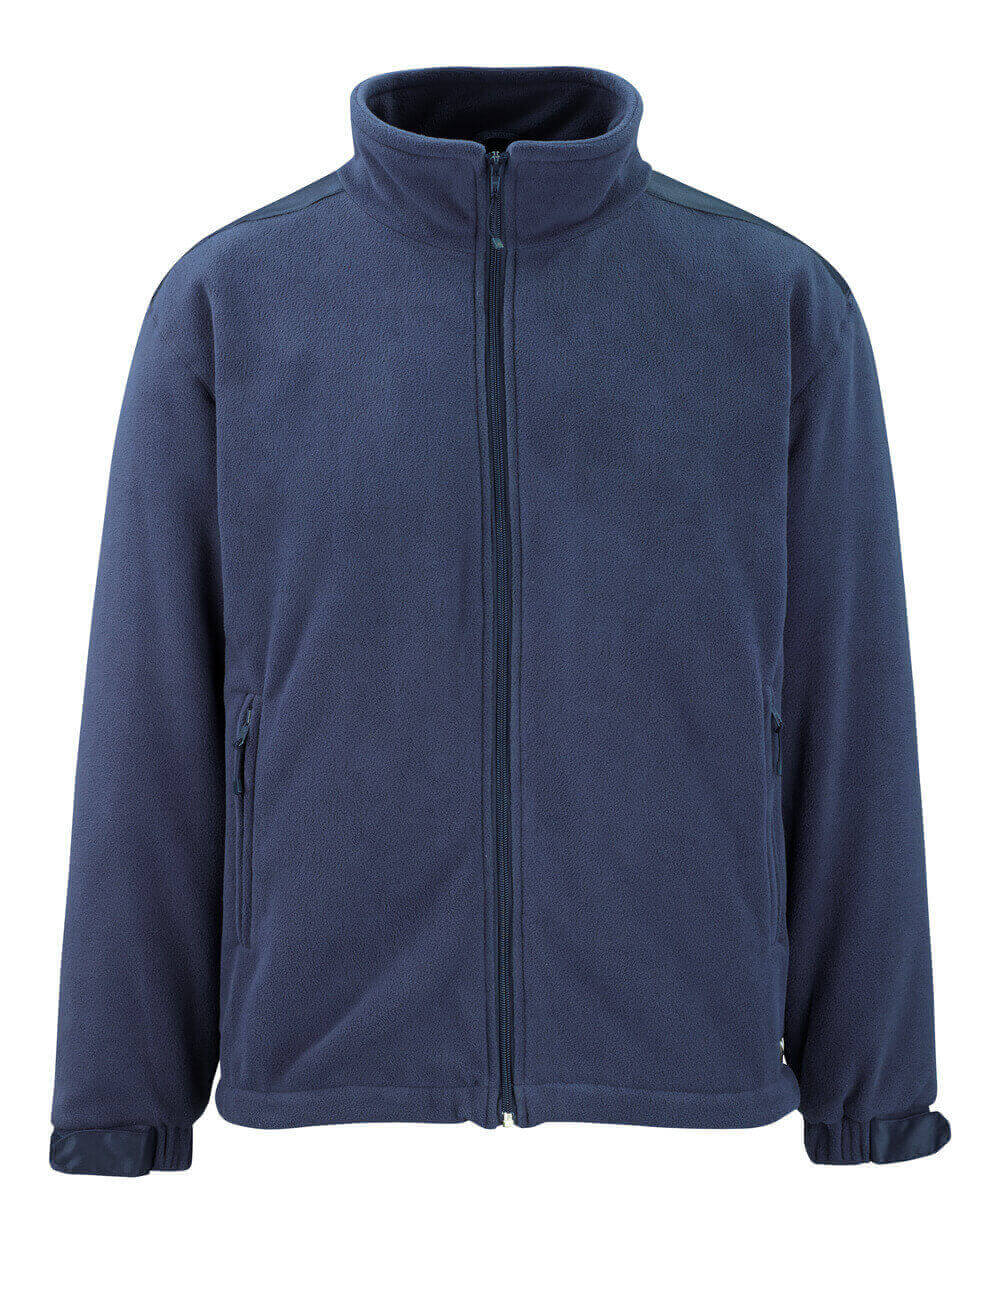 06542-151-01 Chaqueta polar - azul marino